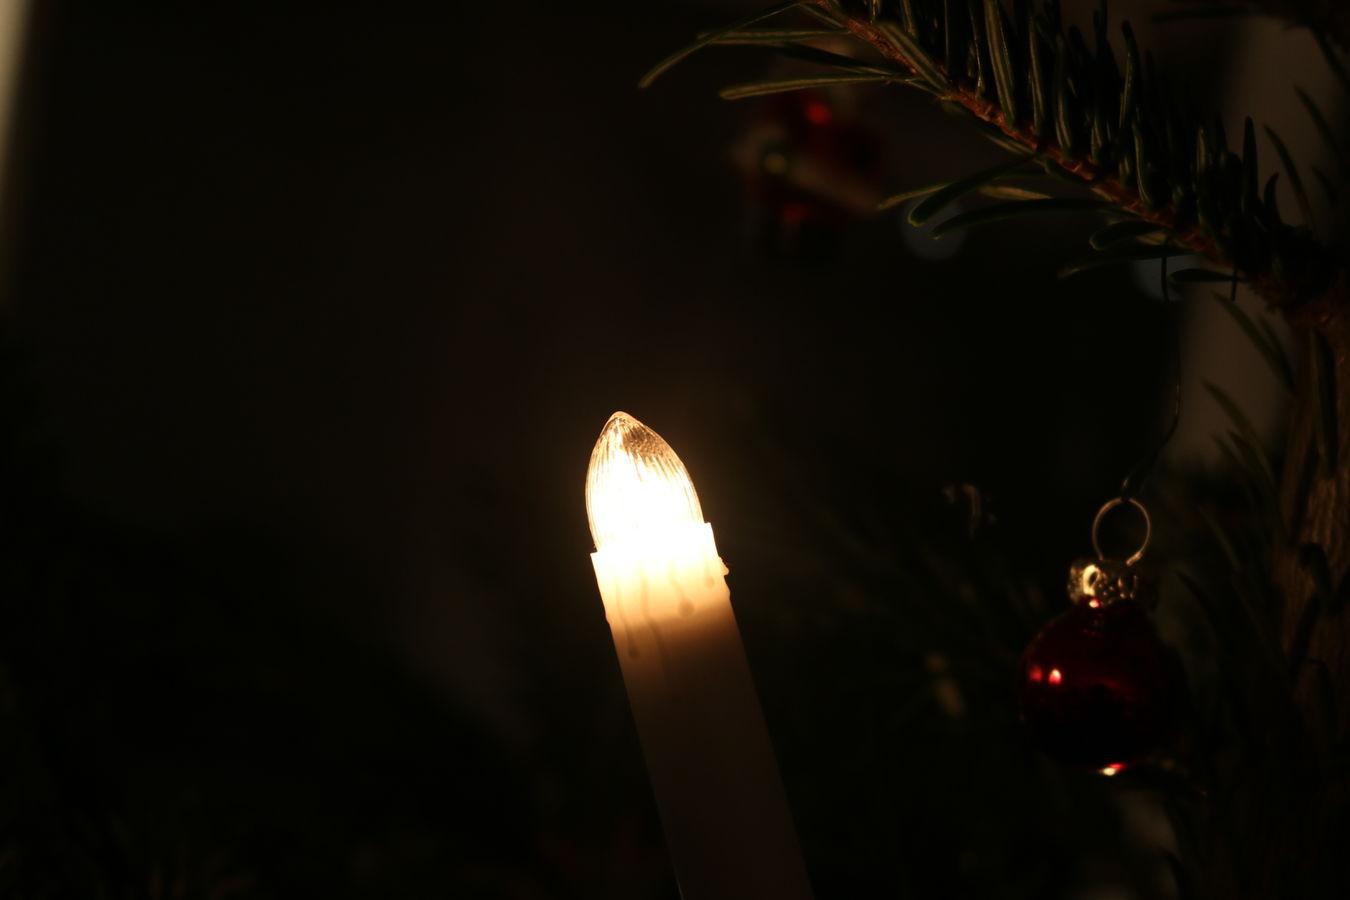 Christmaslight Christmaslight Christmas Decorations Nofilter